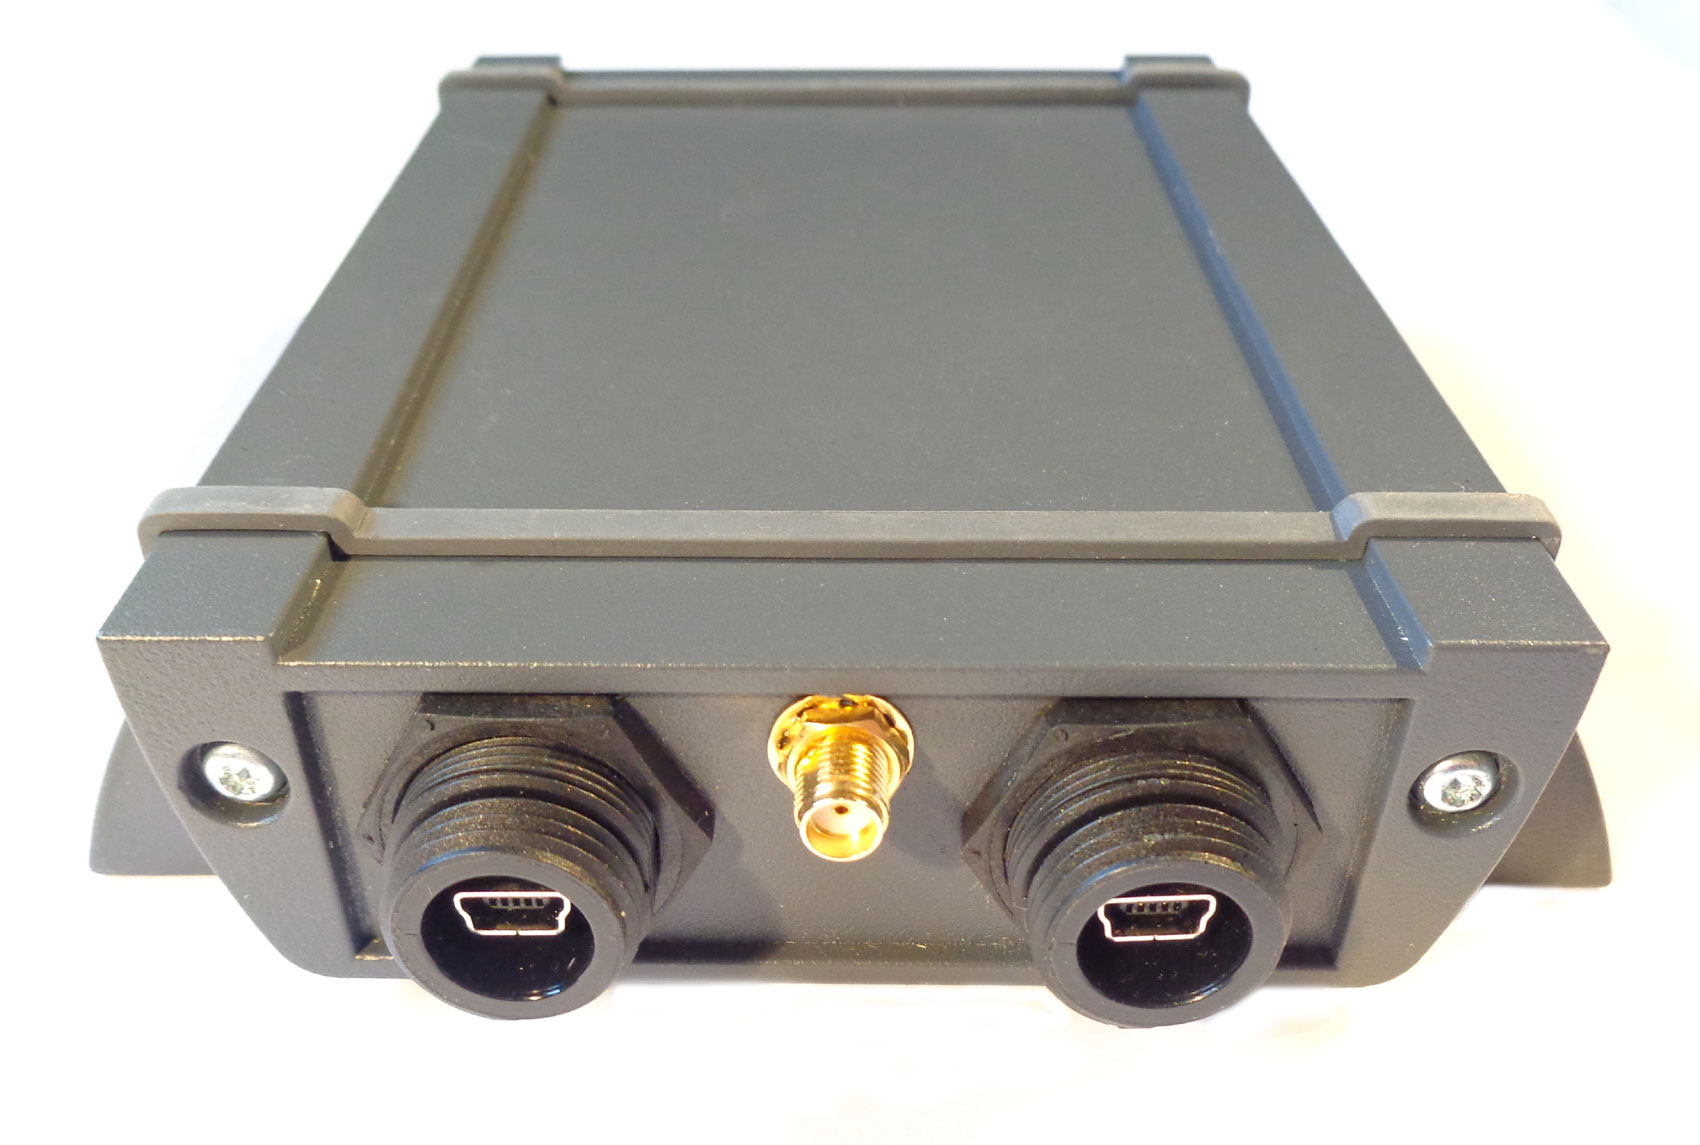 HP-GPS IP65 receiver